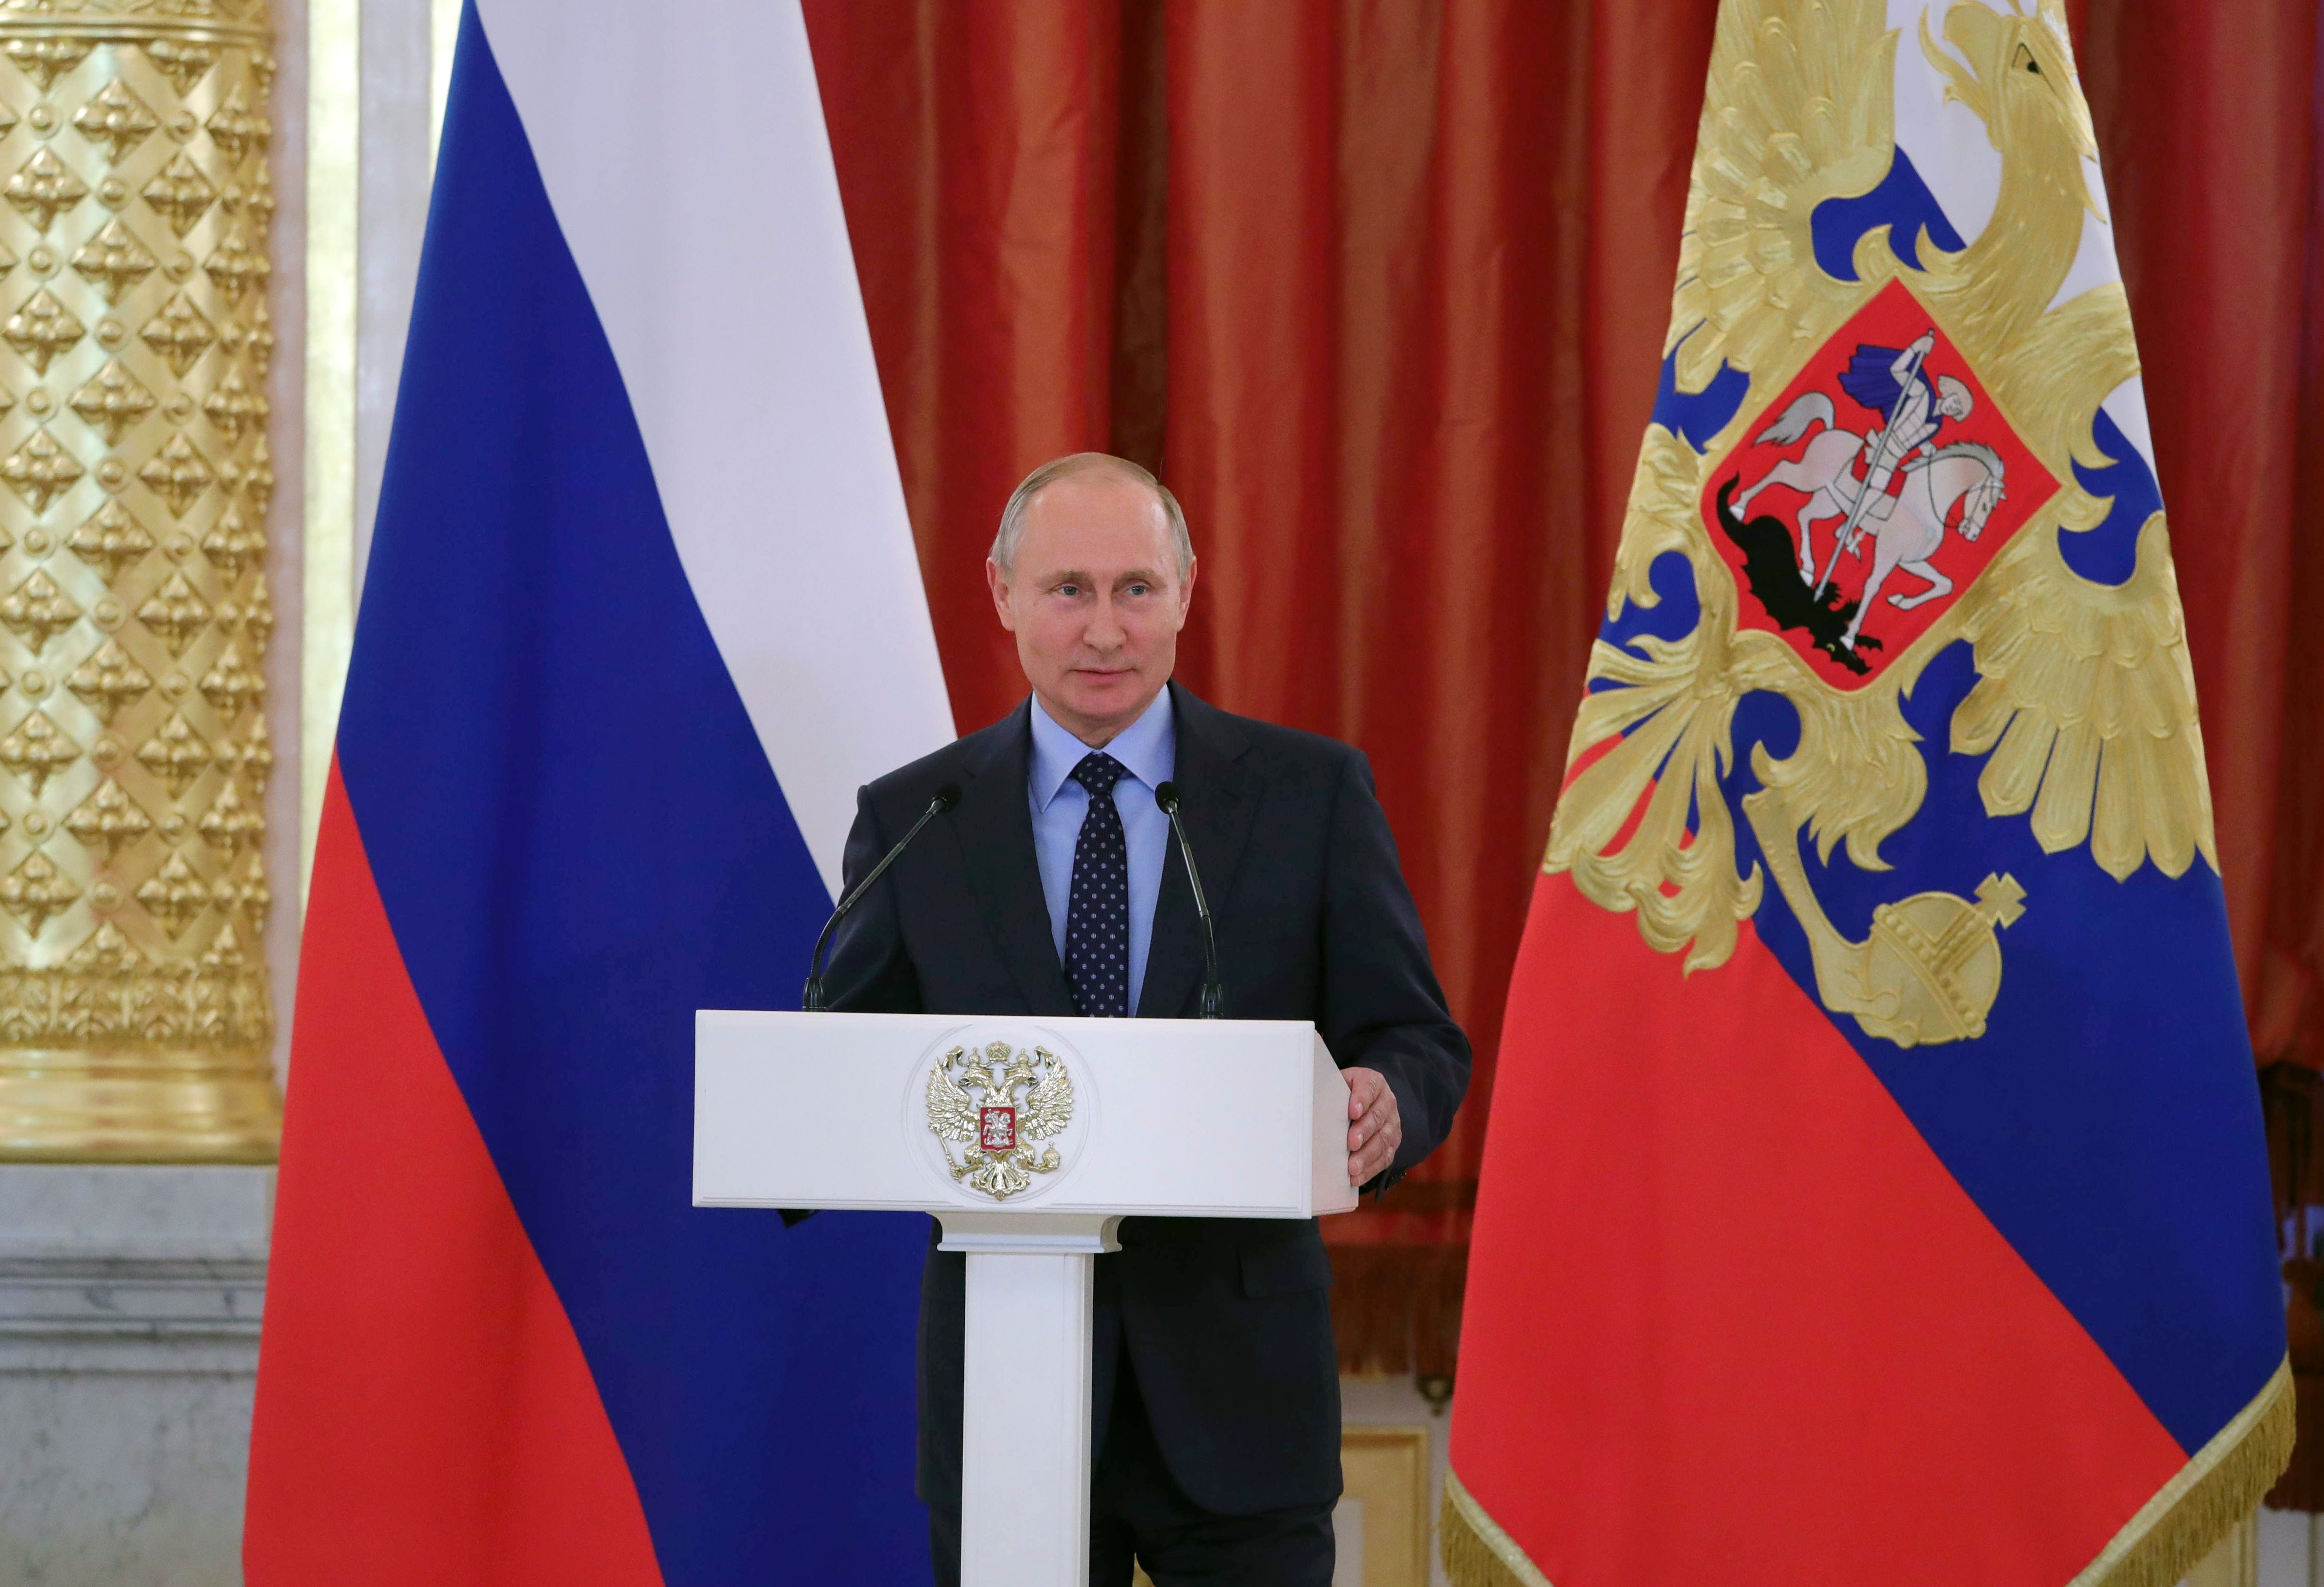 <p><span>Владимир Путин. Фото: &copy;РИА Новости/Михаил Климентьев</span></p>